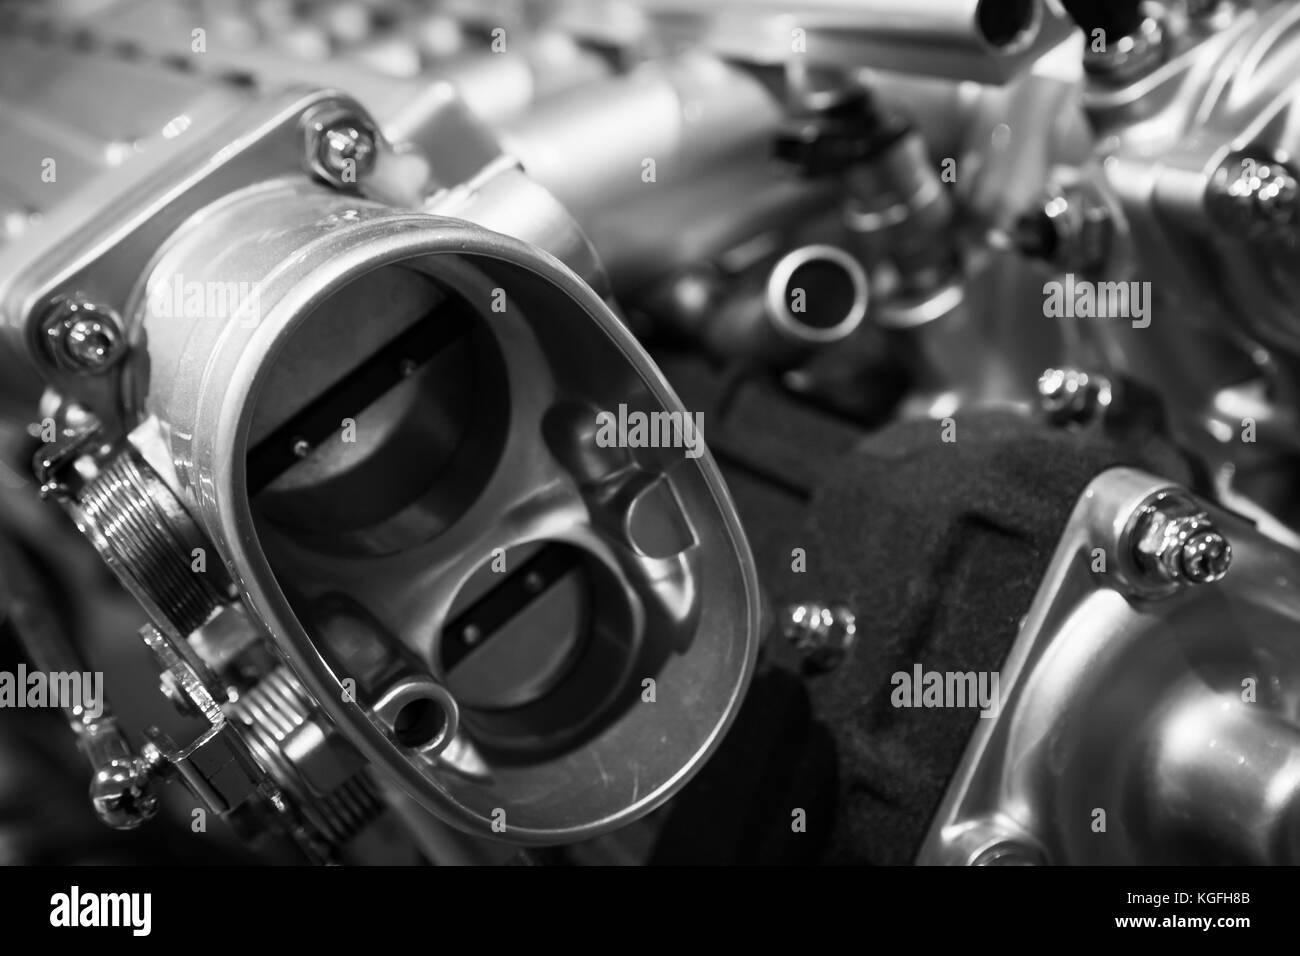 Auto motor Teile, v12-Motor Fragment, closeup Foto mit selektiven ...